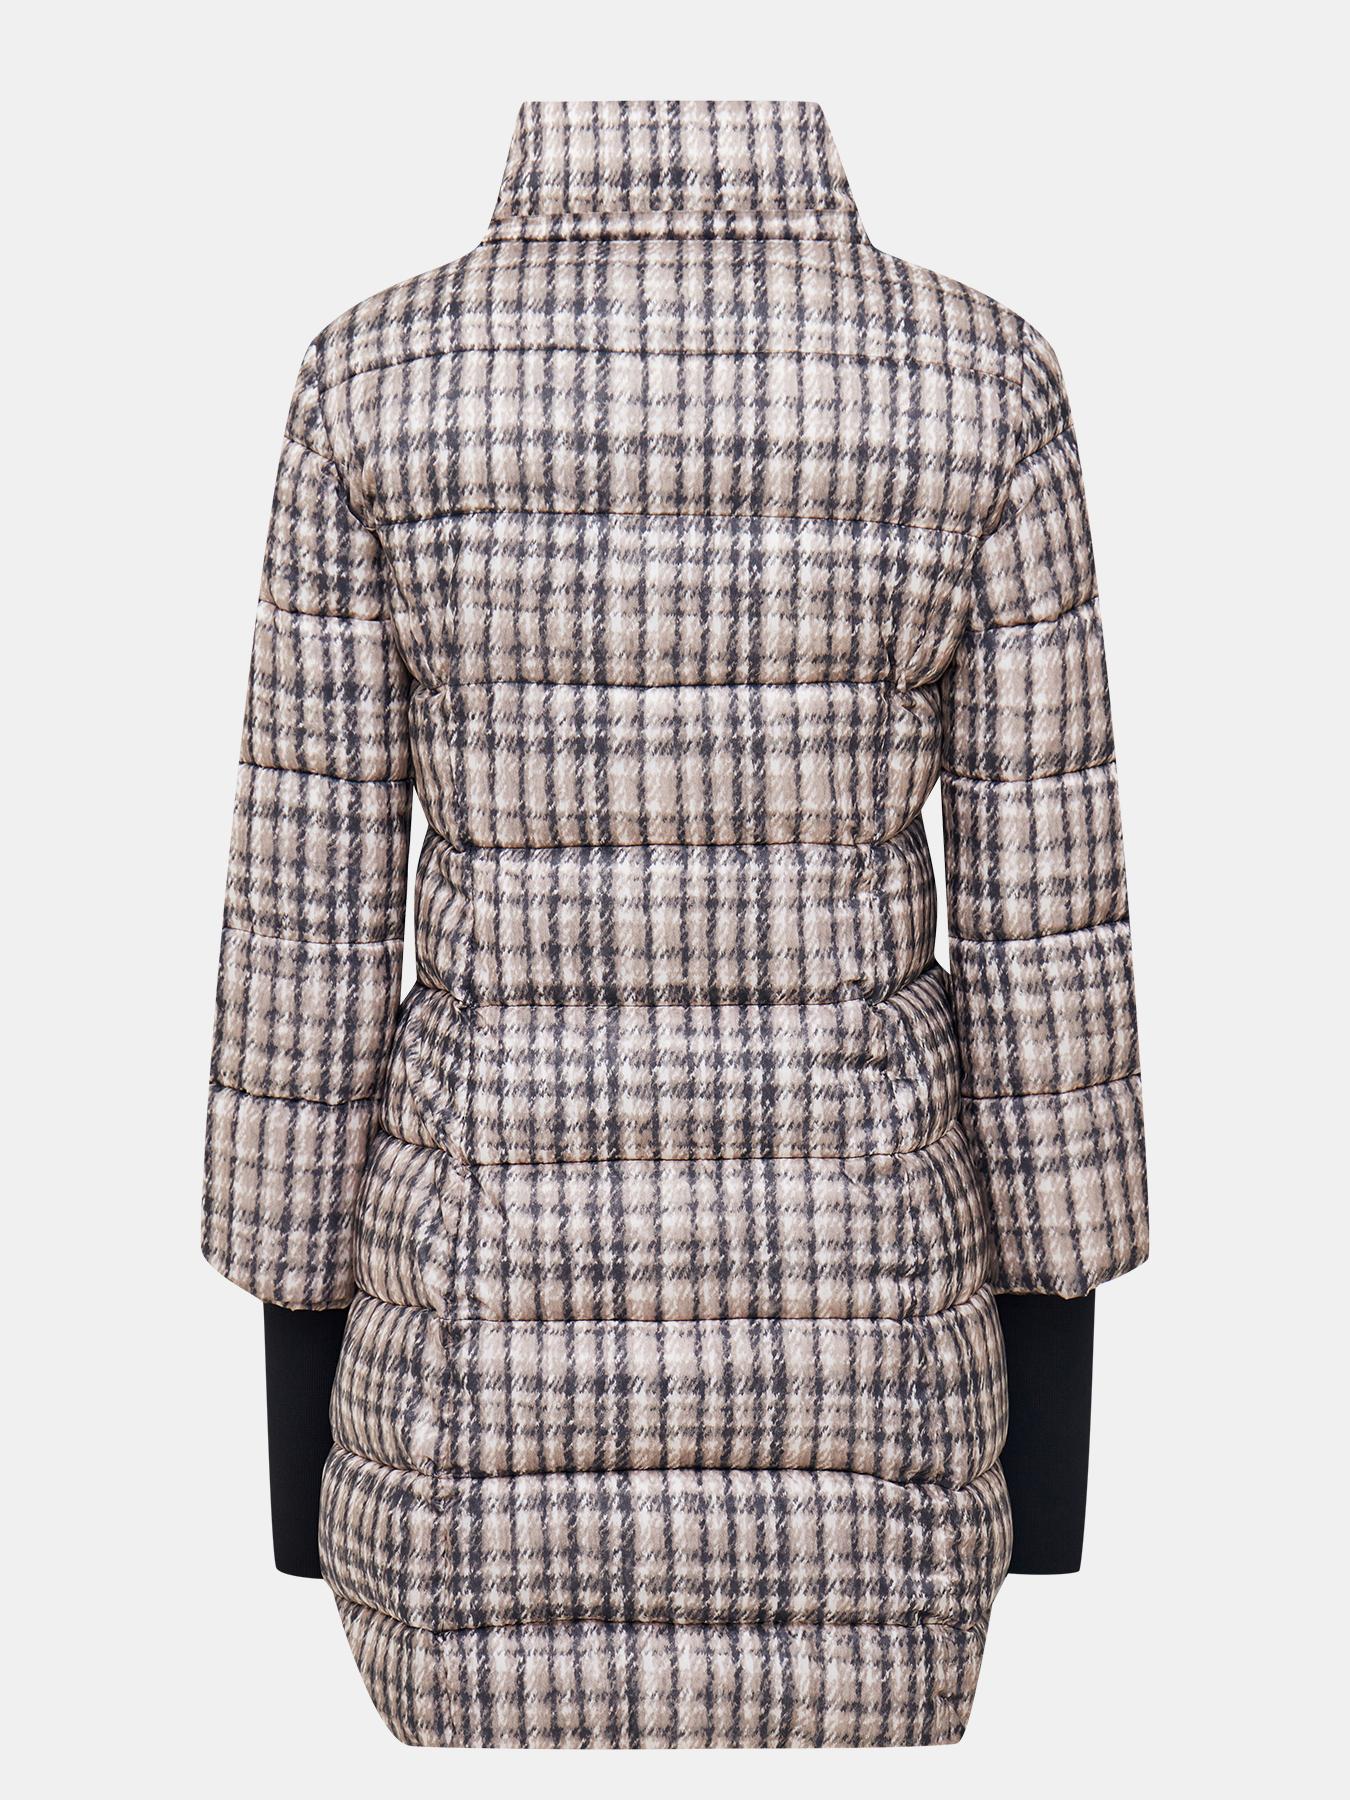 Пальто Patrizia Pepe Куртка куртка patrizia pepe 8l0210 a2hs k103